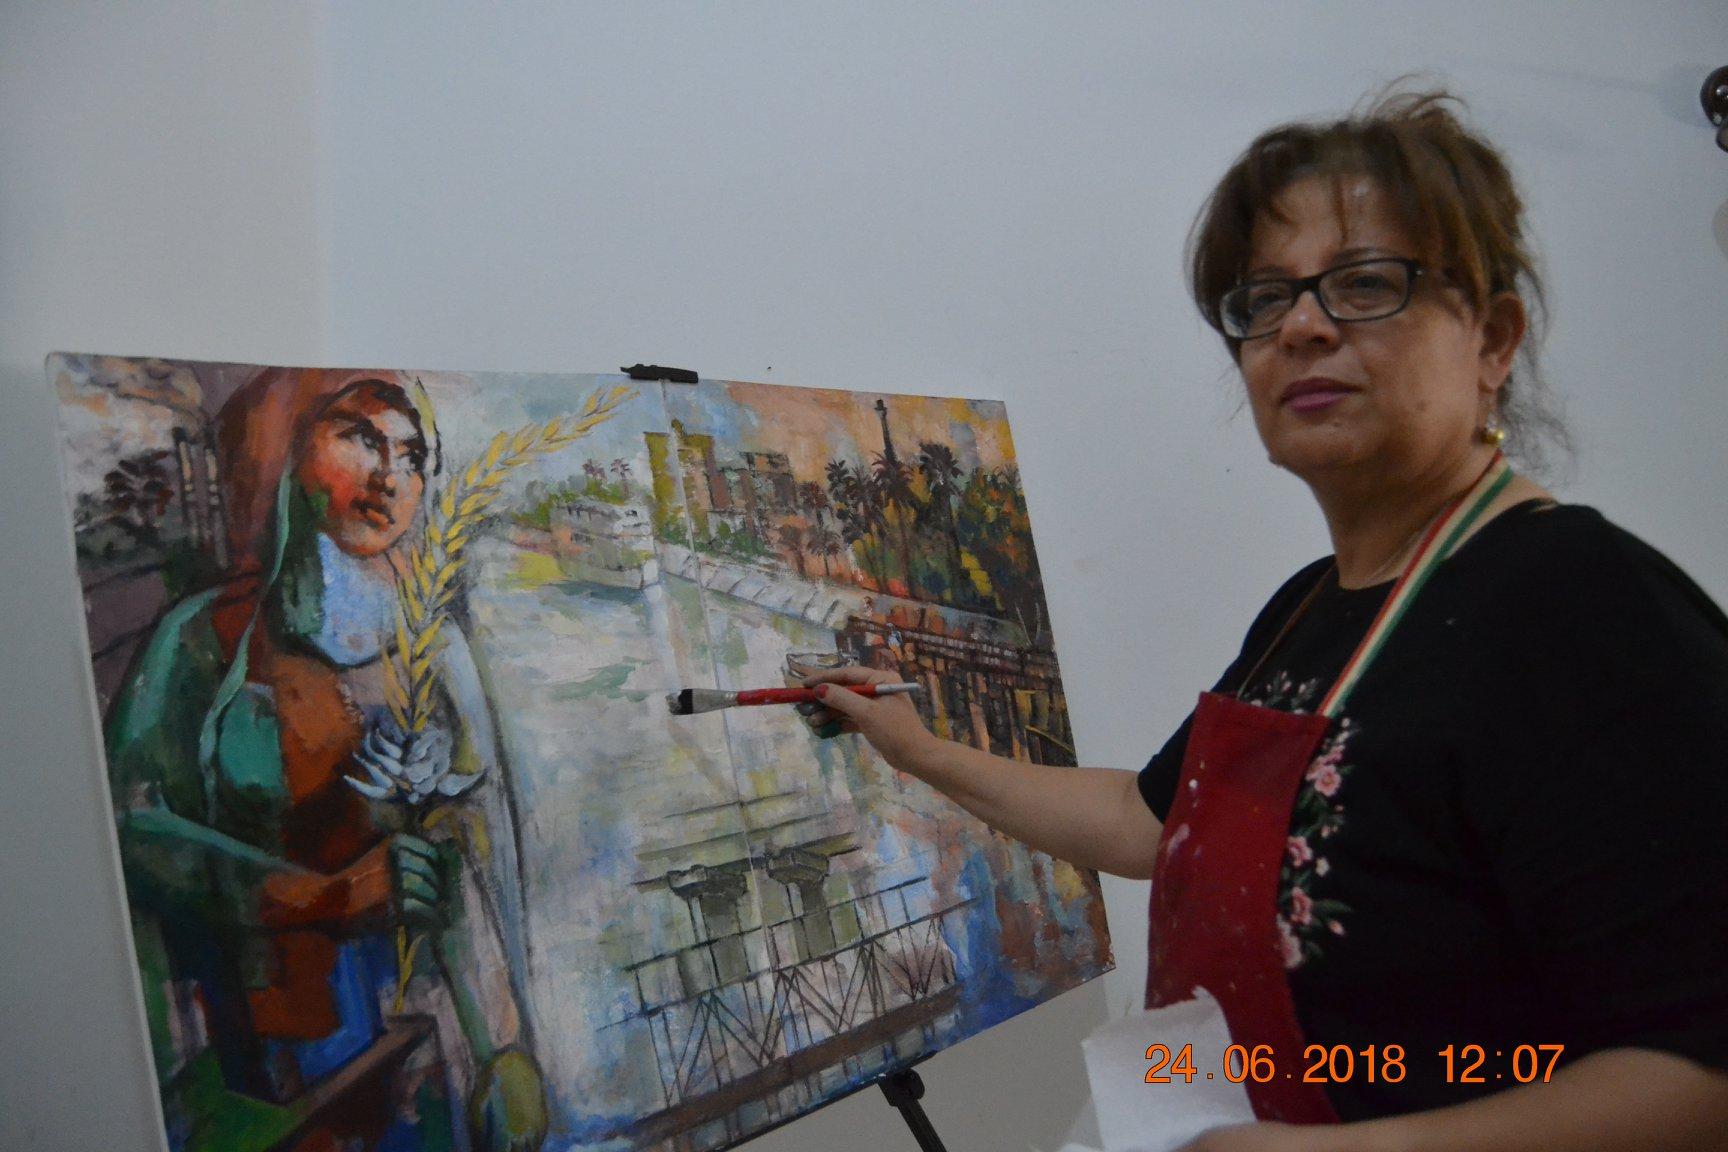 فنانين تشكليين يرسمون قناطر اسيوط  (2)